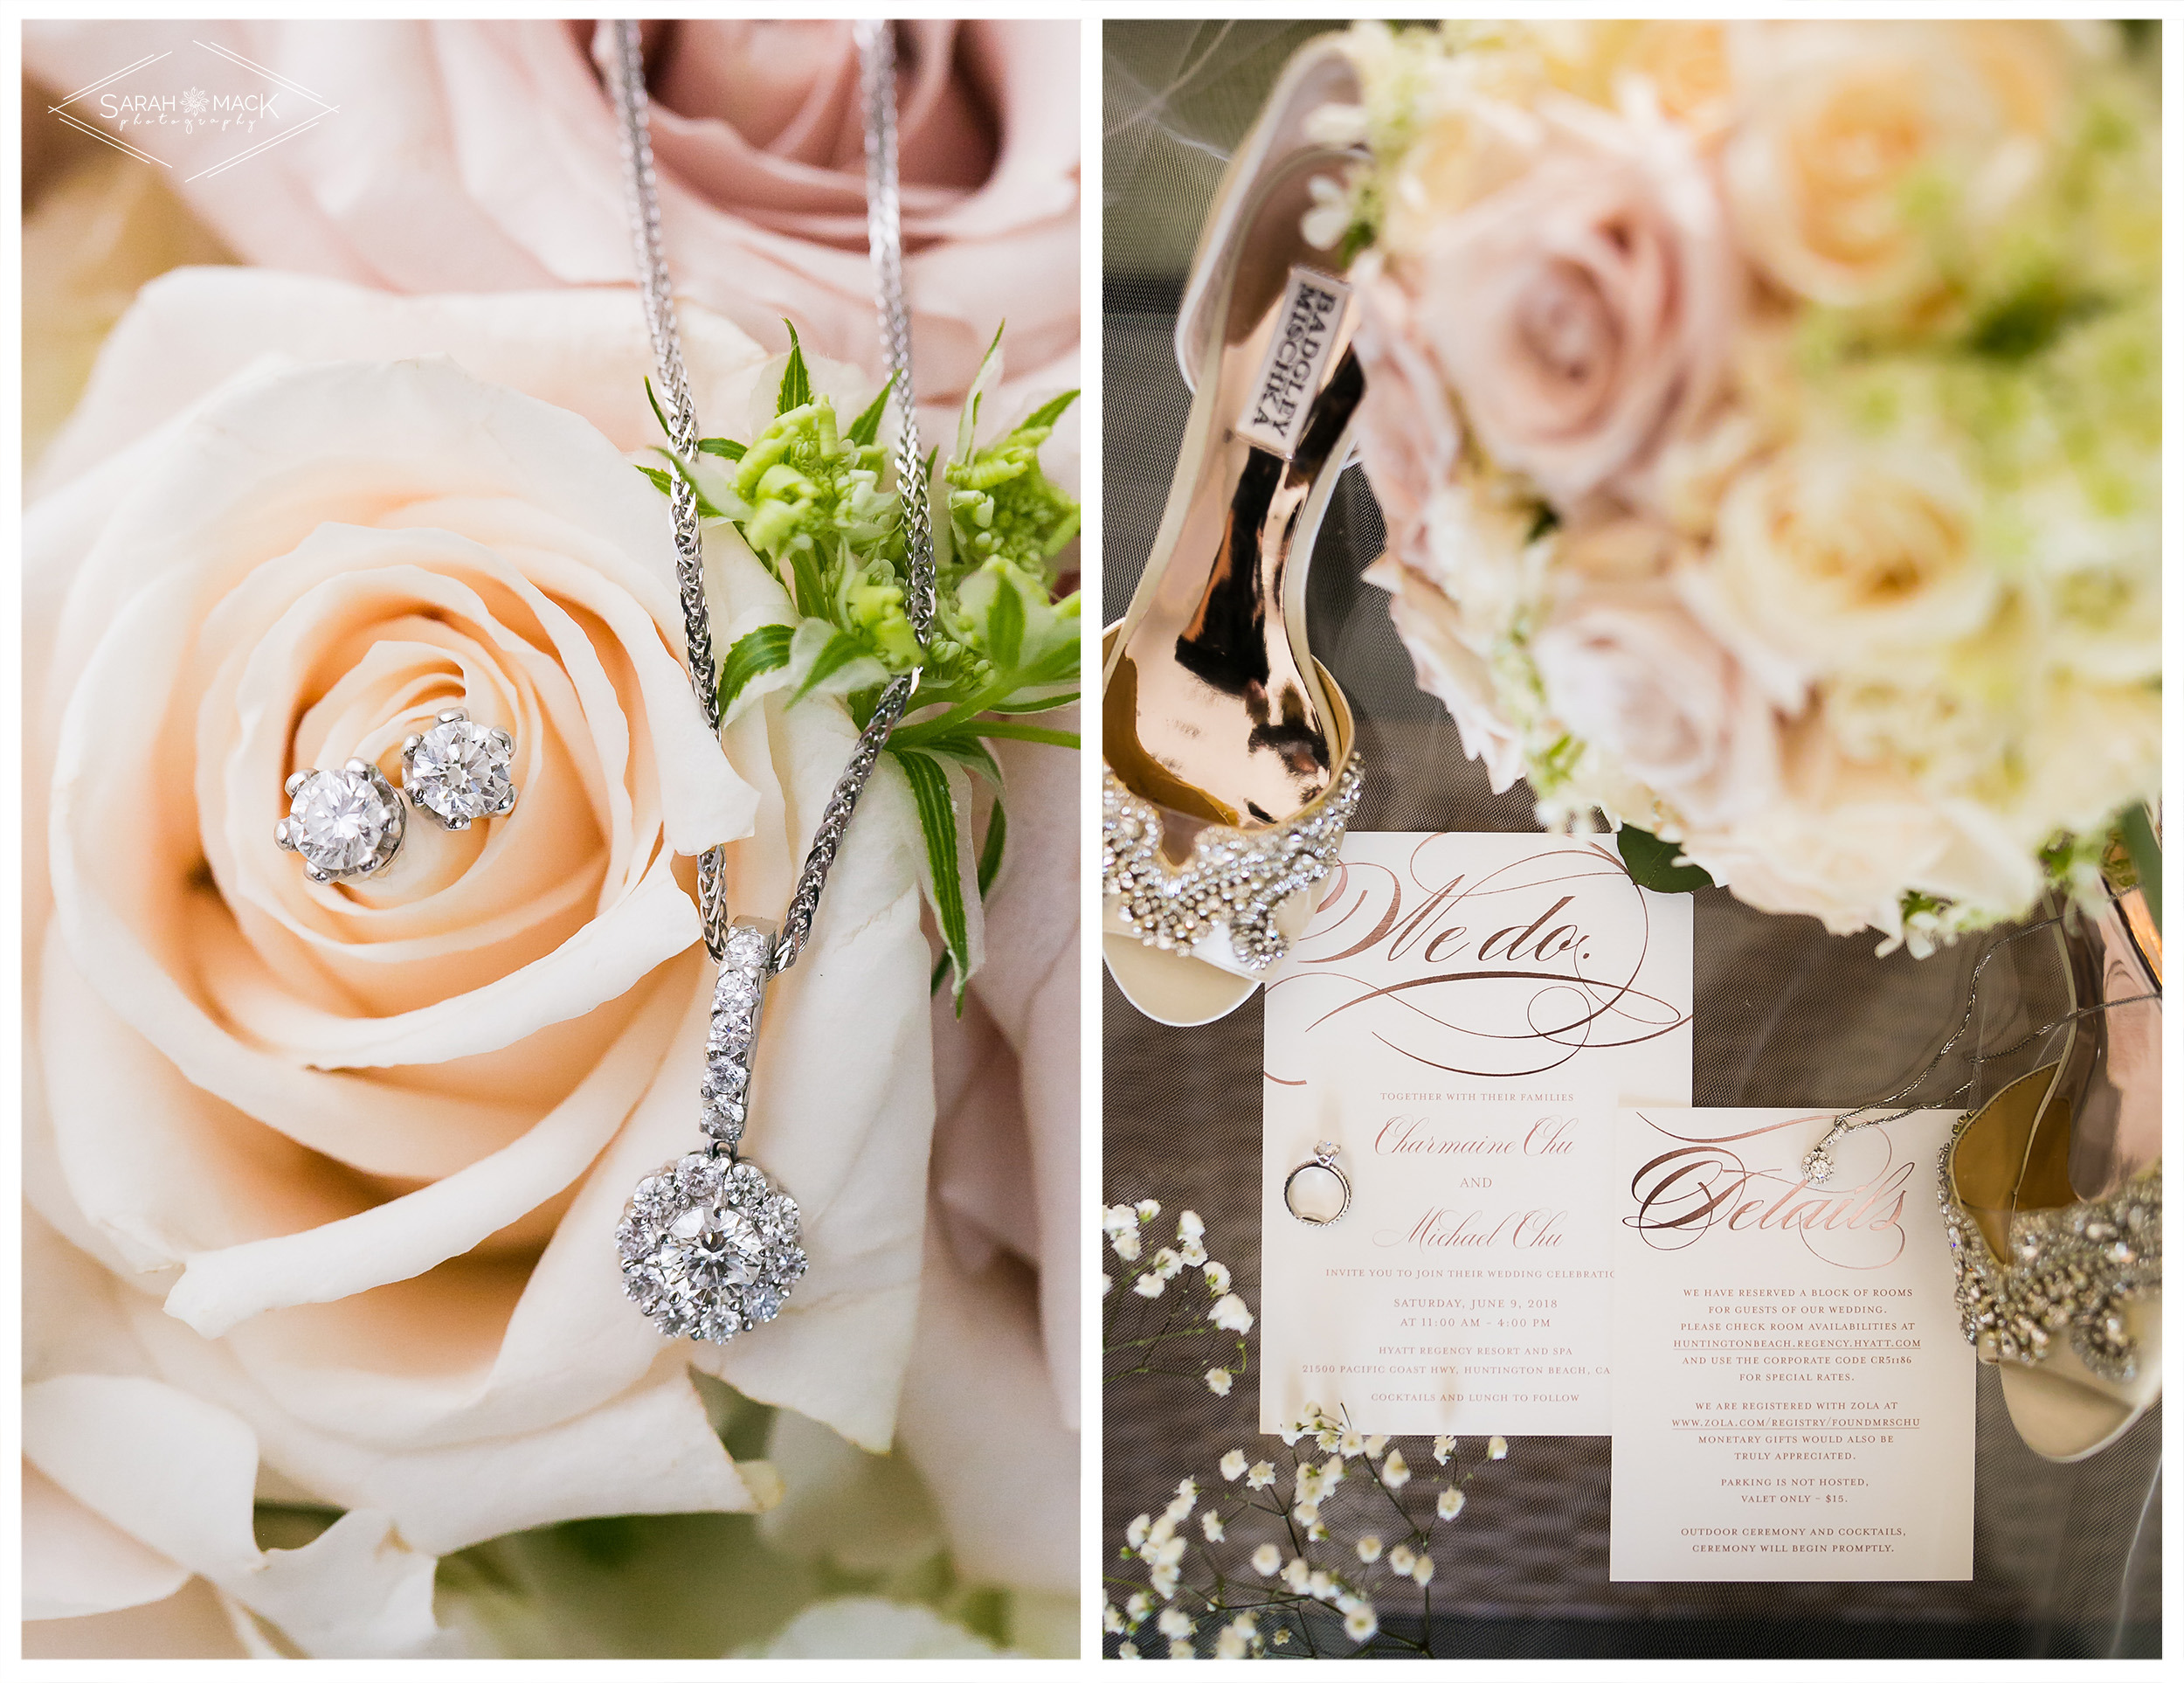 MC-Hyatt-Huntington-Beach-Wedding-Photography-2.jpg